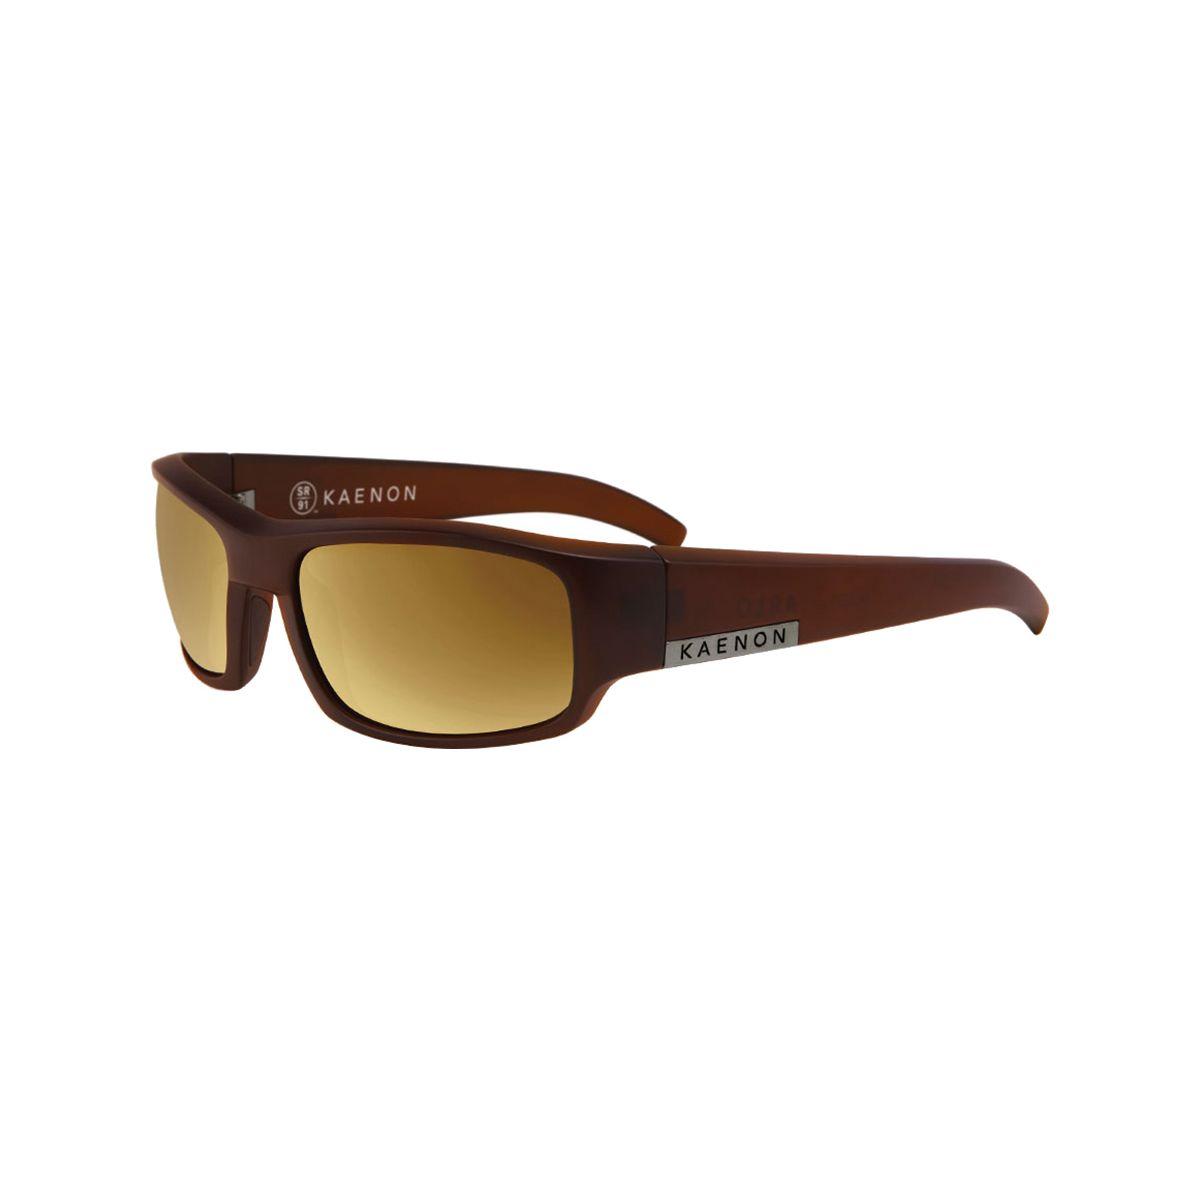 Kaenon Arlo Sunglasses  Polarized